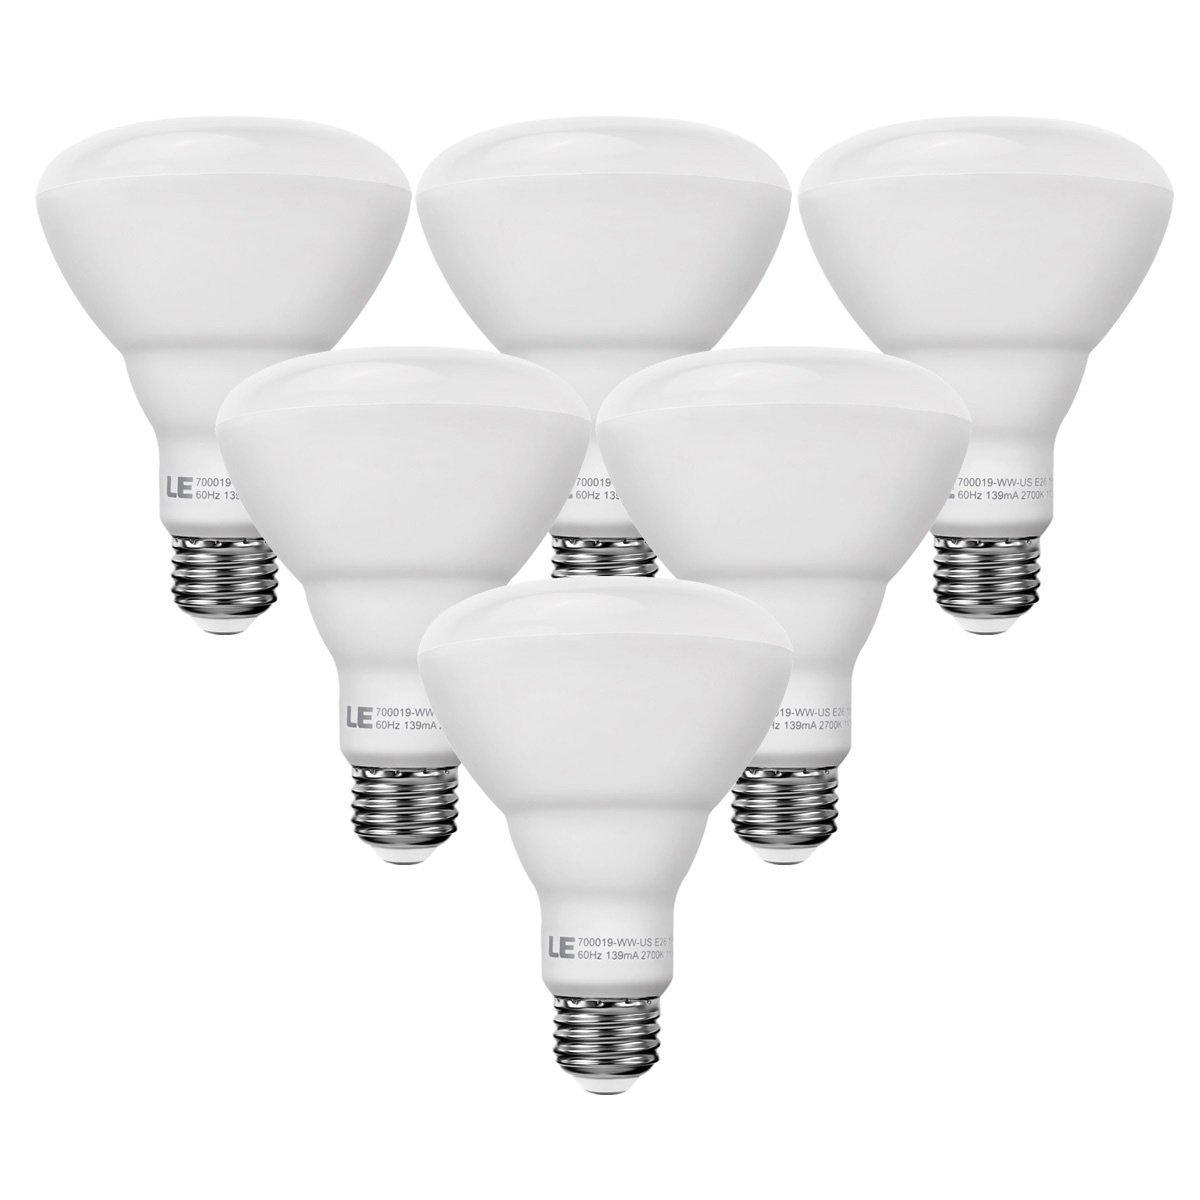 LE 6 Pack Dimmable BR30 E26 LED Bulbs, 75W Incandescent Equivalent, 15W, LED Recessed Can Lights, 1100lm, Warm White, 2700K, 110° Flood Beam, E26 Base, LED Light Bulbs, LED Flood Light Bulb